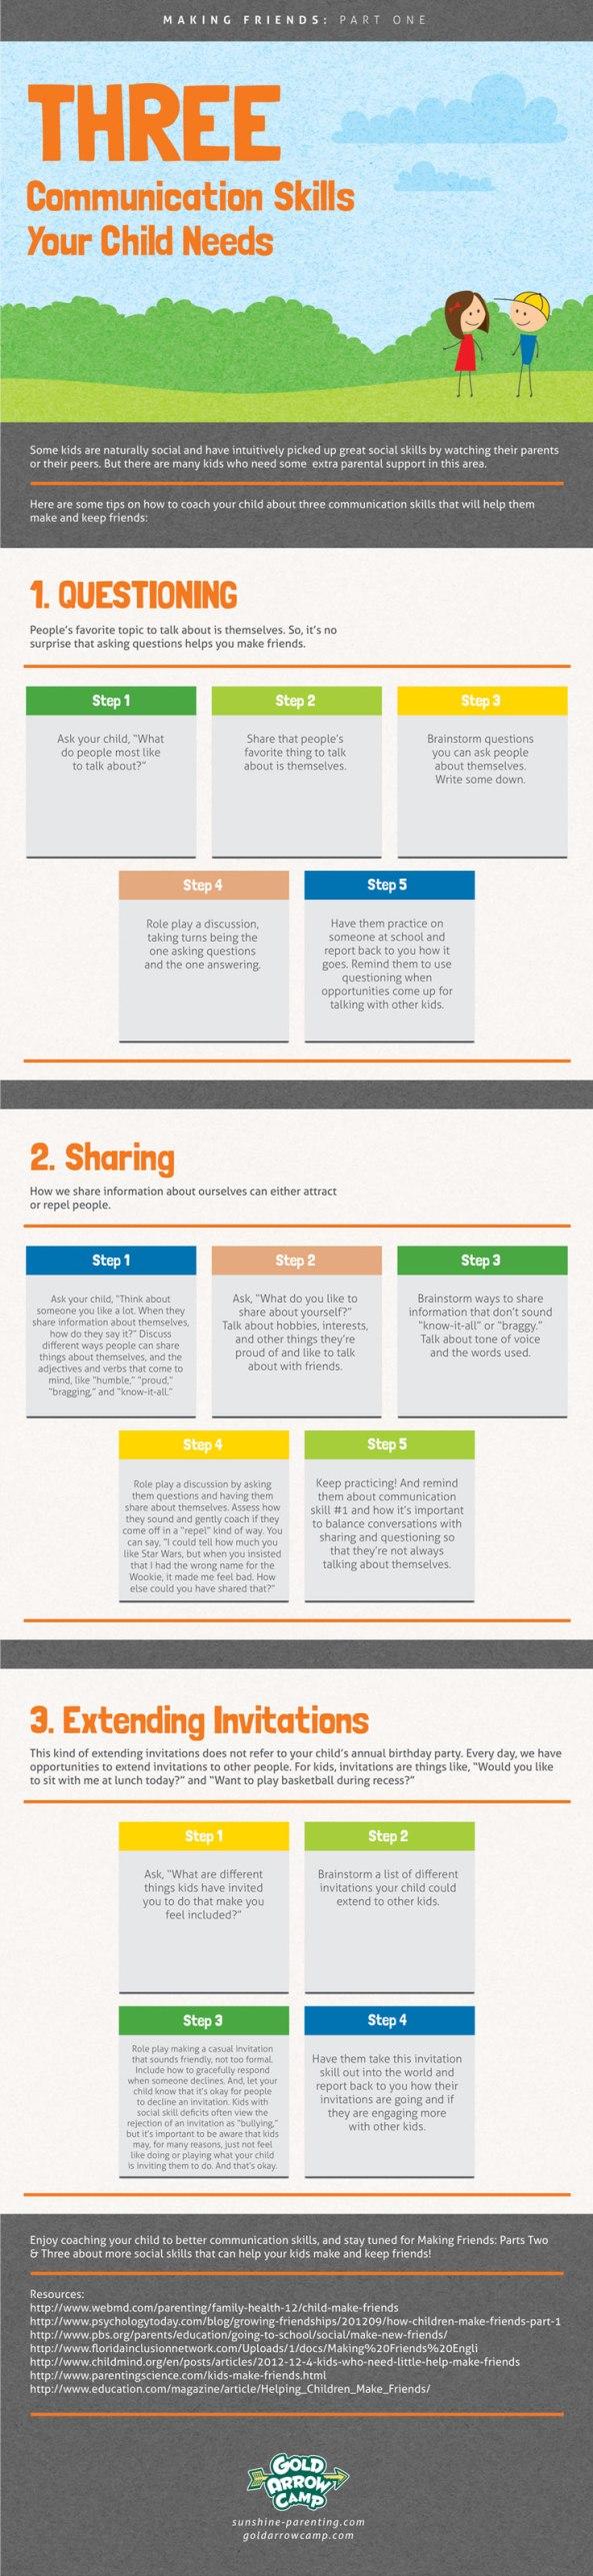 Making Friends, Part One: Three Communication Skills